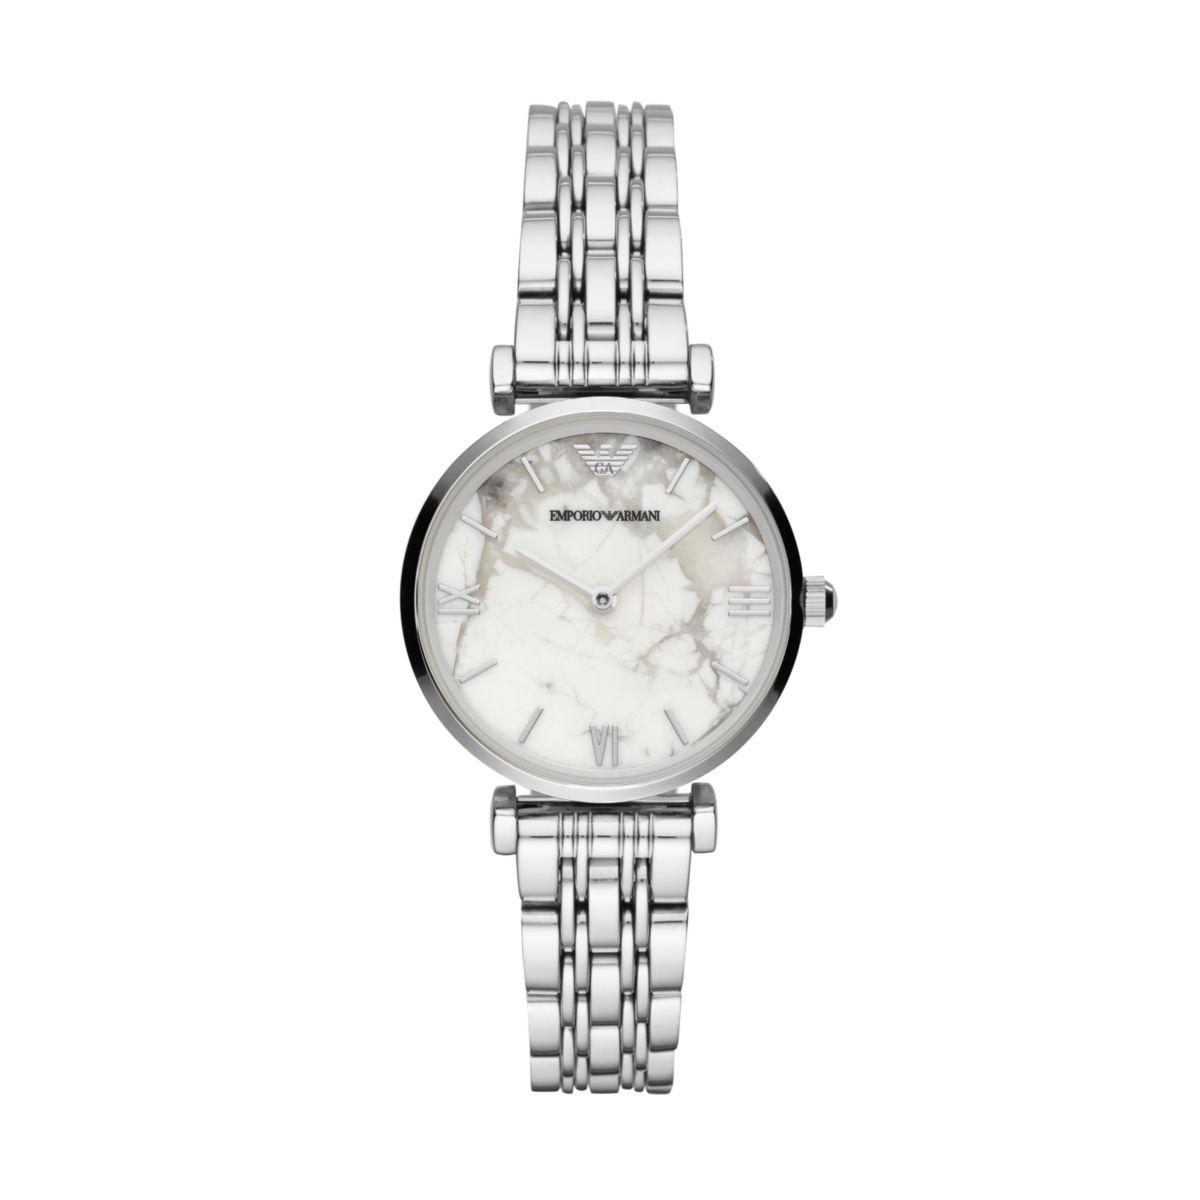 Emporio Armani阿玛尼手表钢带经典时尚休闲石英女士腕表AR11170